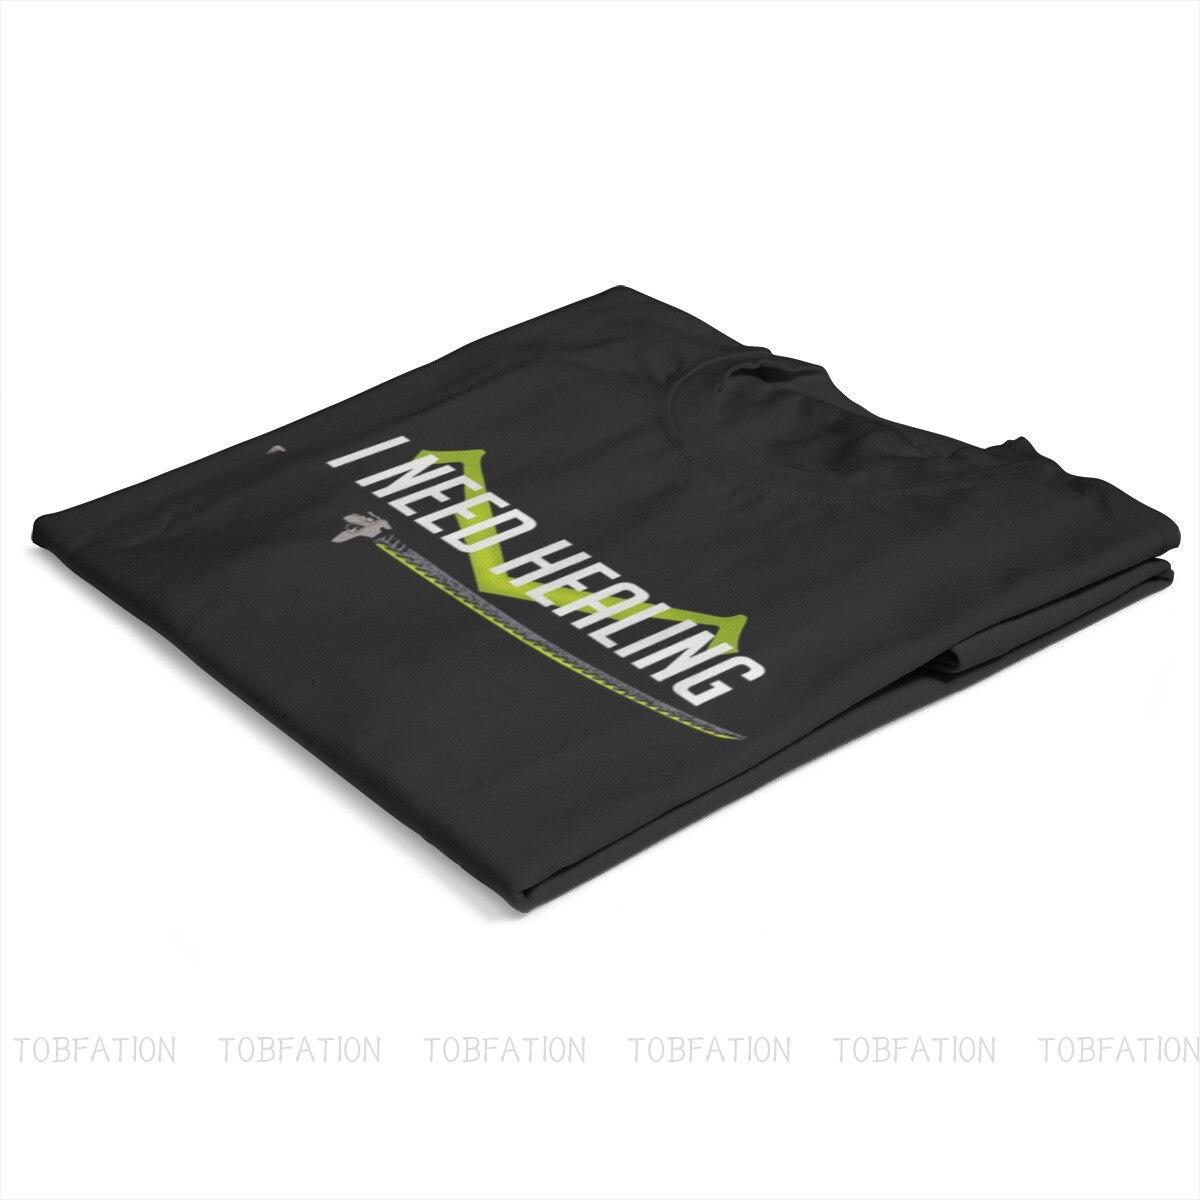 I need healing O Neck TShirt Overwatch Fabric Basic T Shirt Man's Tops New Design Oversized 2